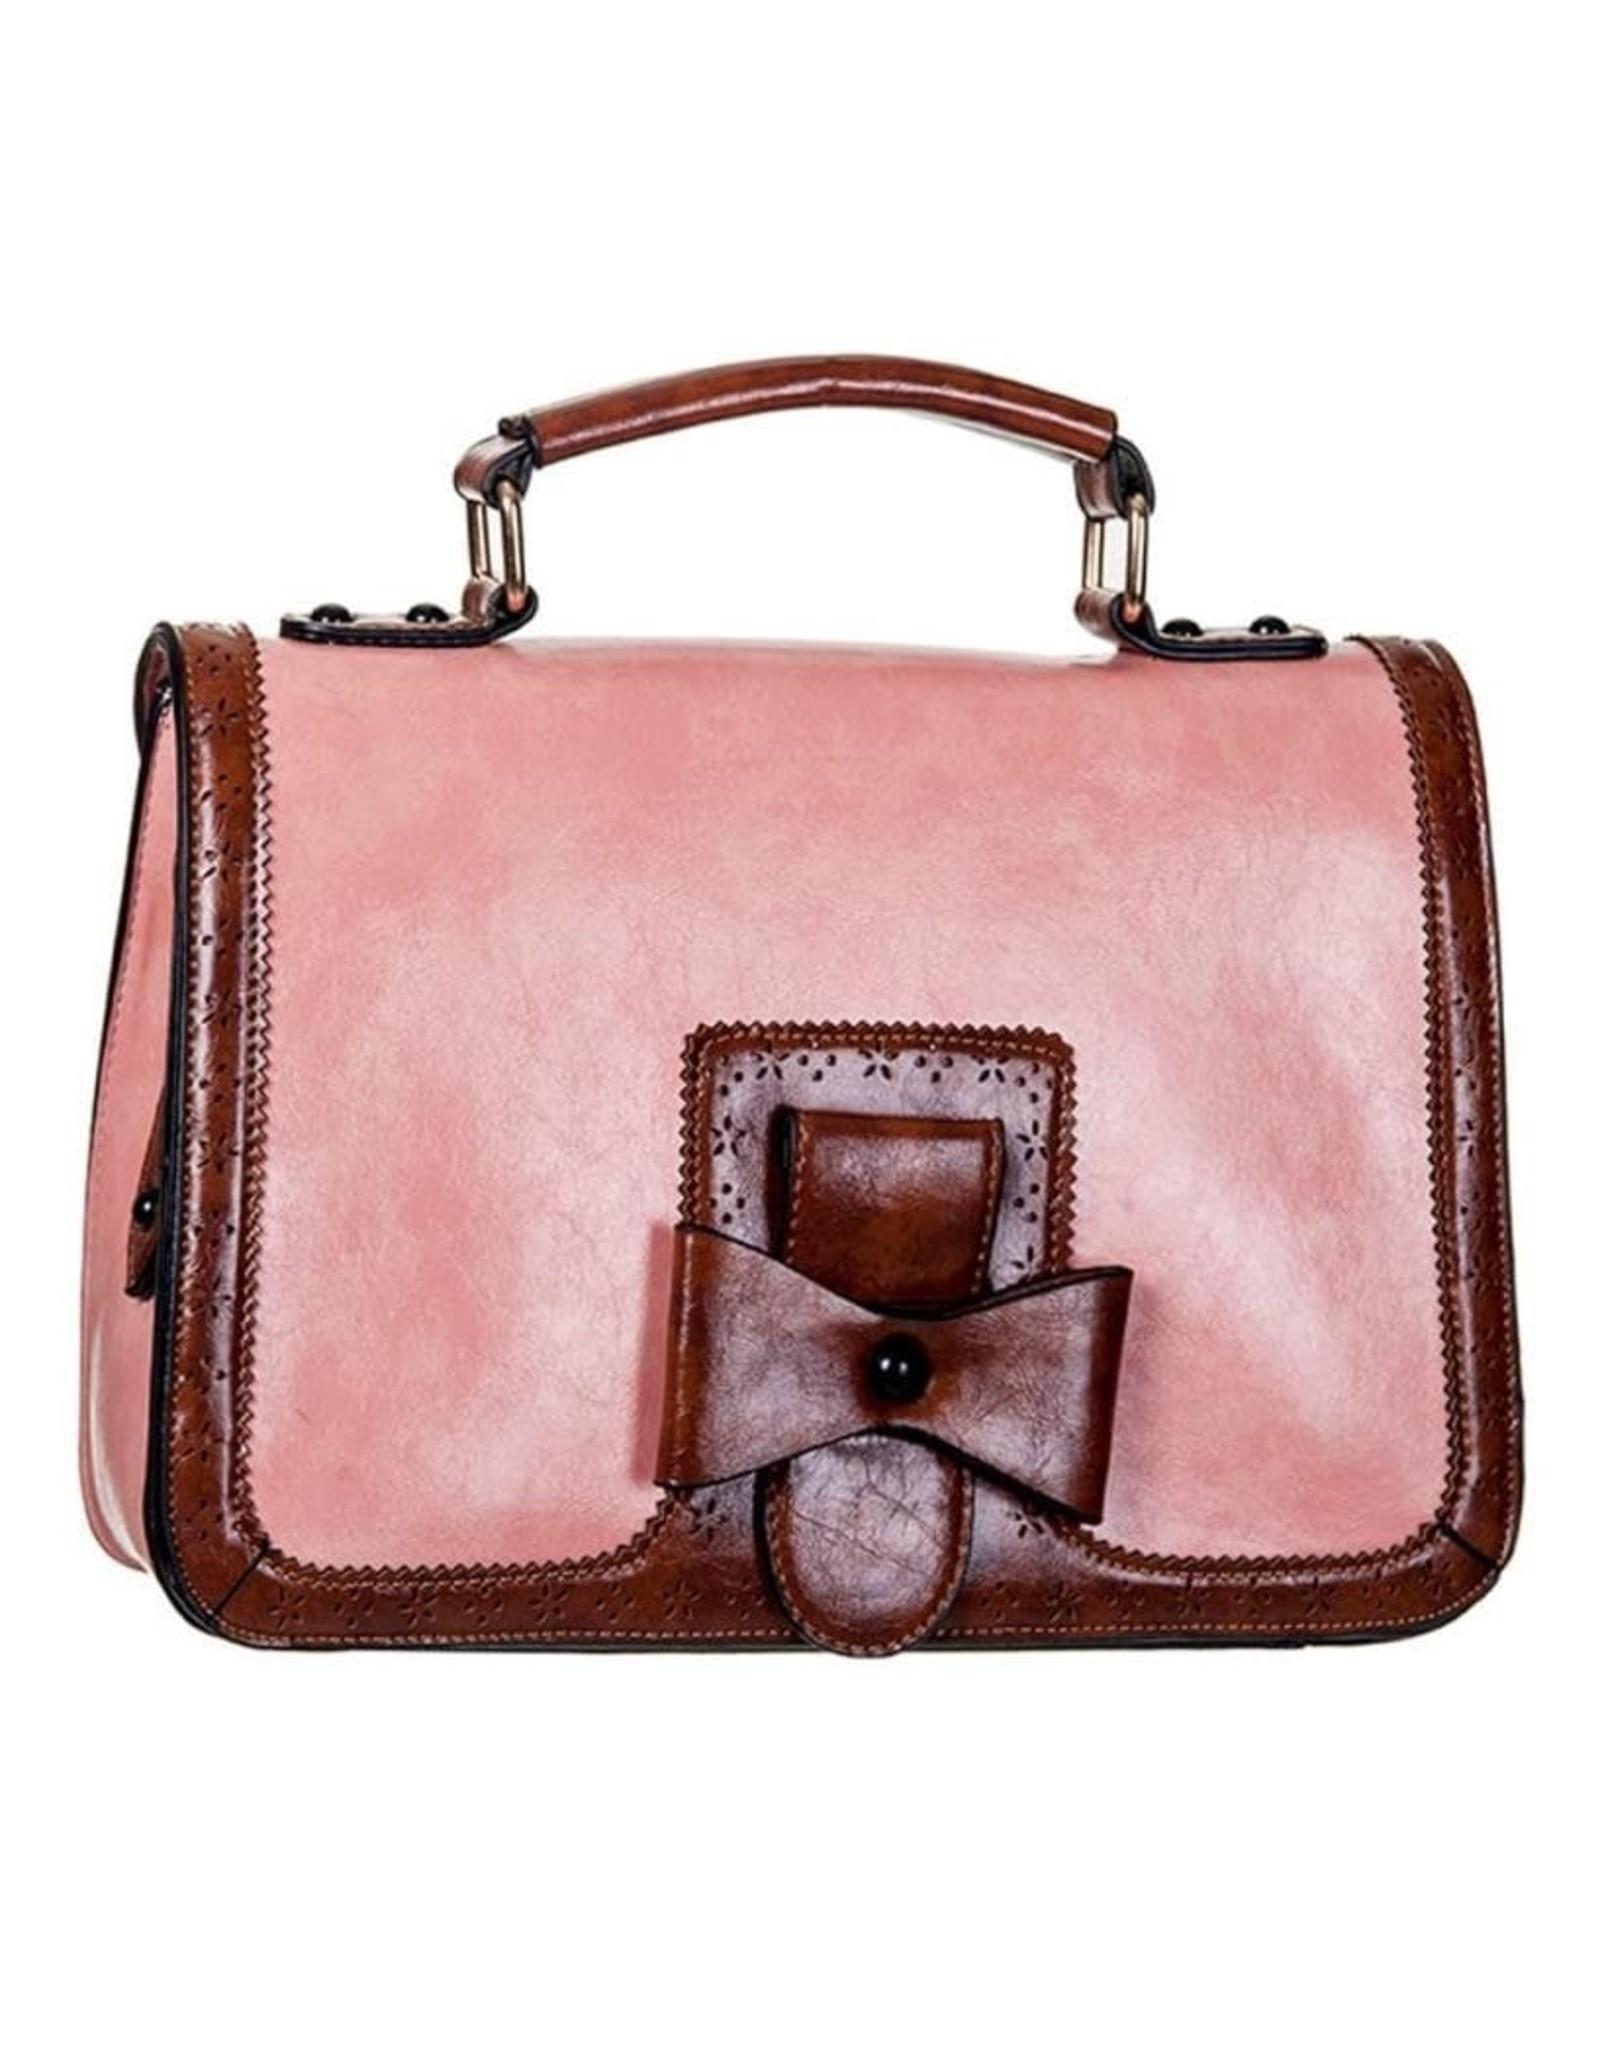 Banned Retro tassen Vintage tassen - Banned Vintage hantas Scandal (roze)